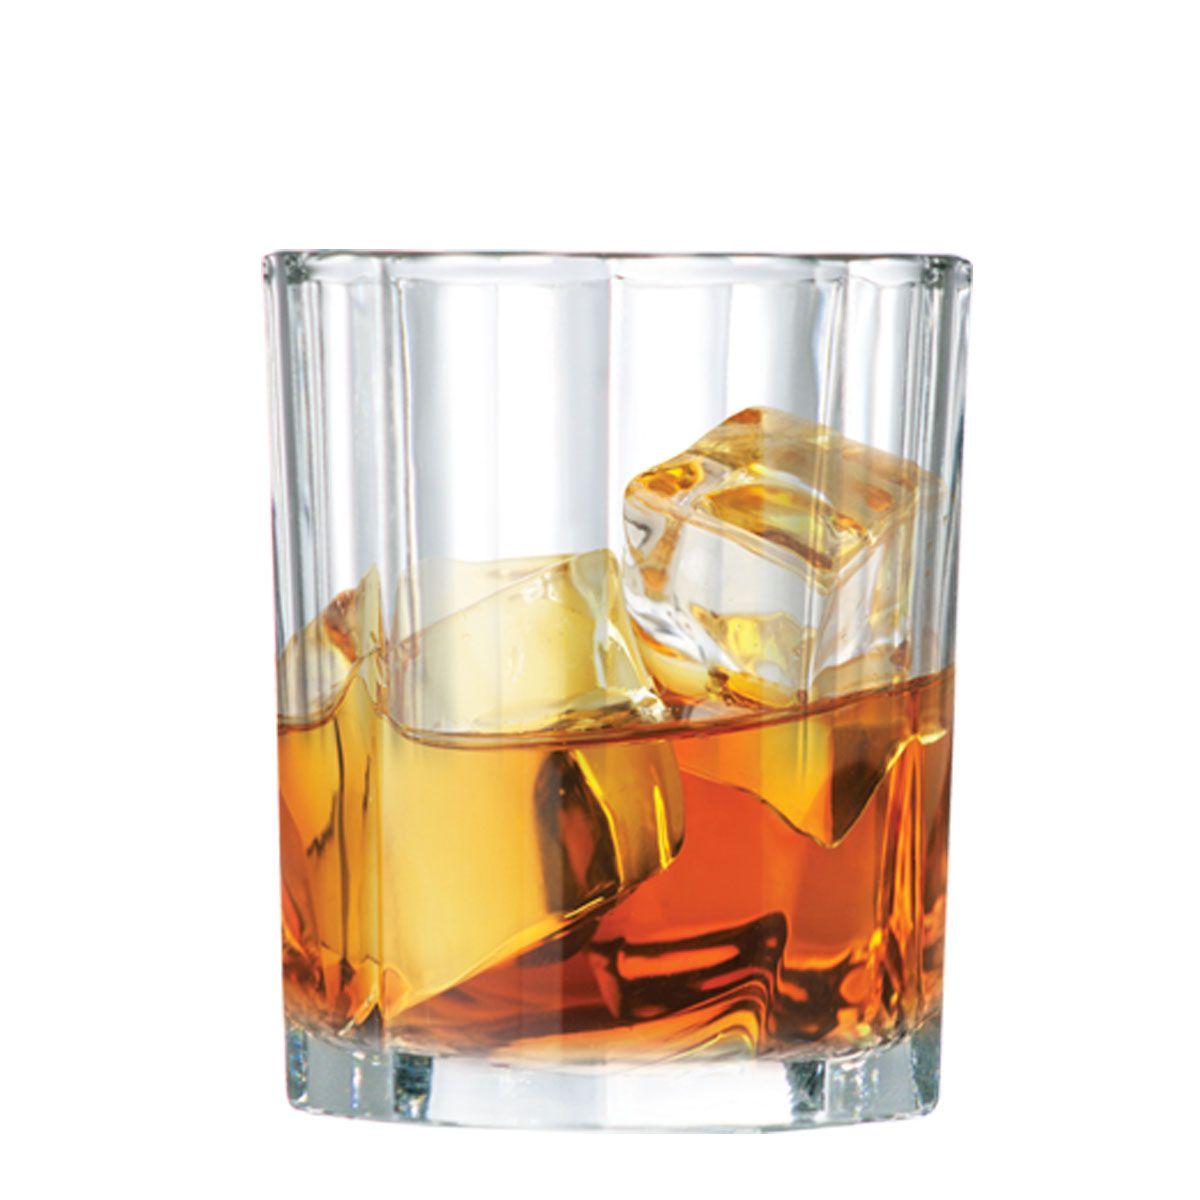 Copo Whiskys Shot Vidro Jogo Conjunto 280ml Kit Rocks 2 Pcs